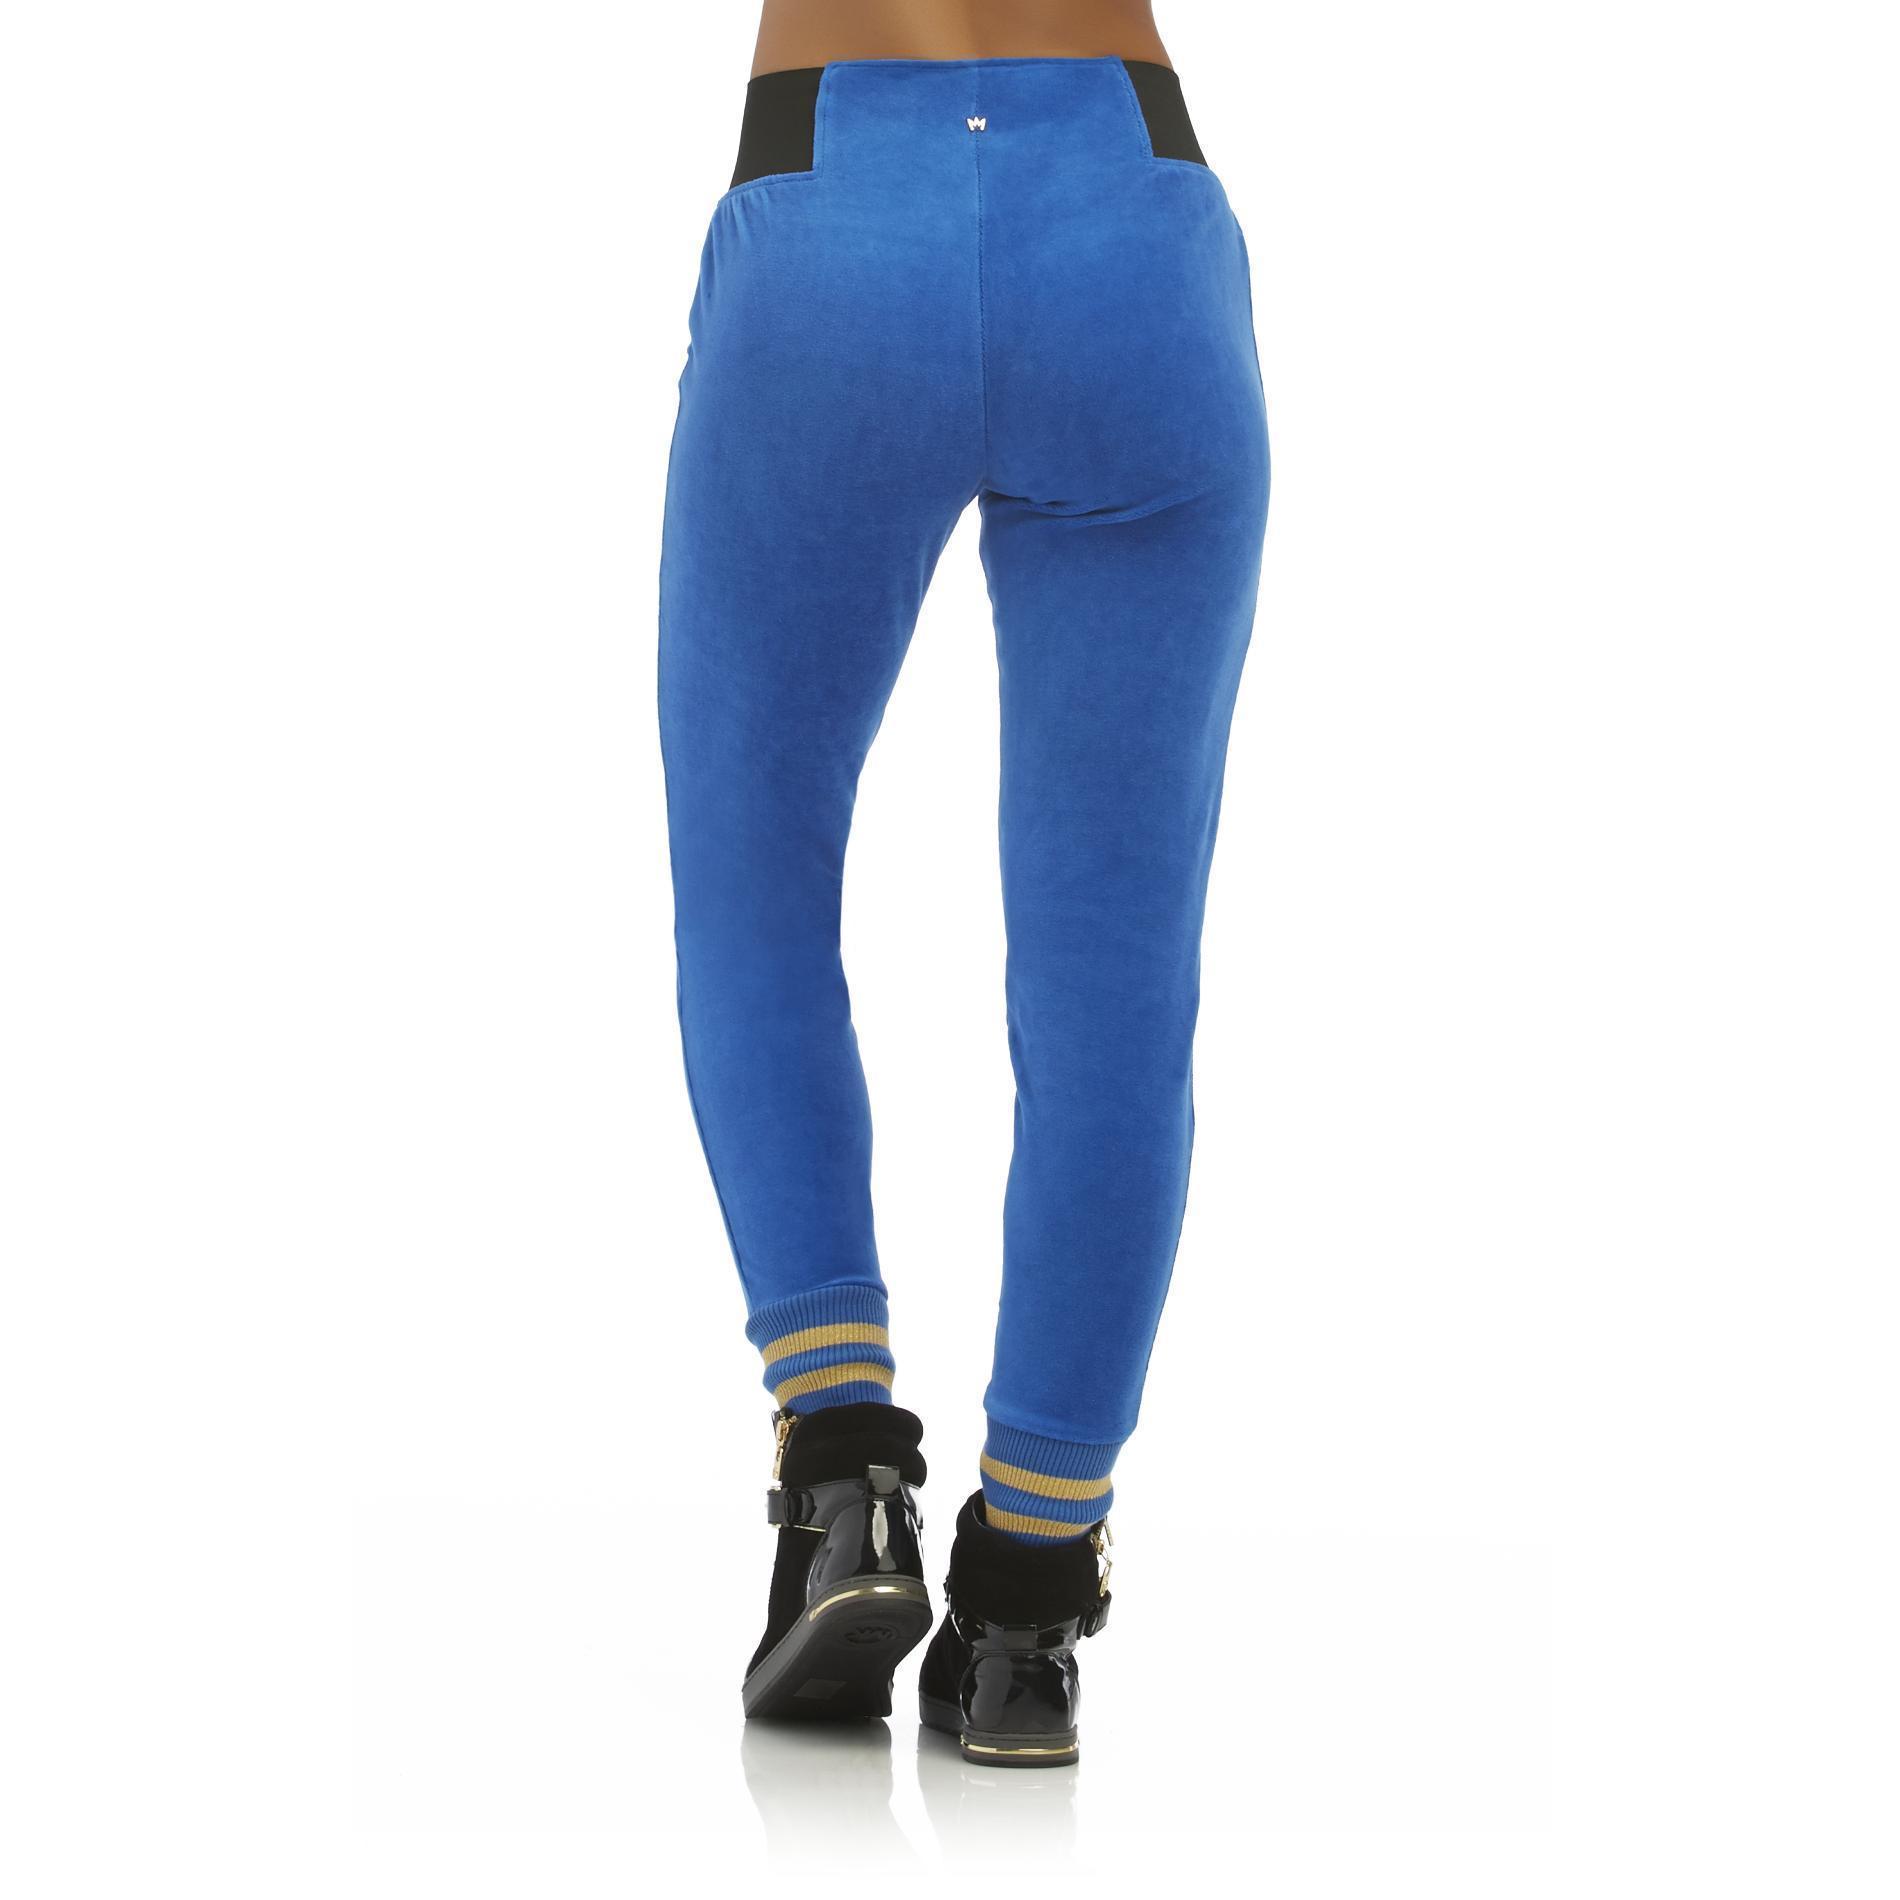 Nicki Minaj Women's Velour Jogger Pants - Clothing - Women ...